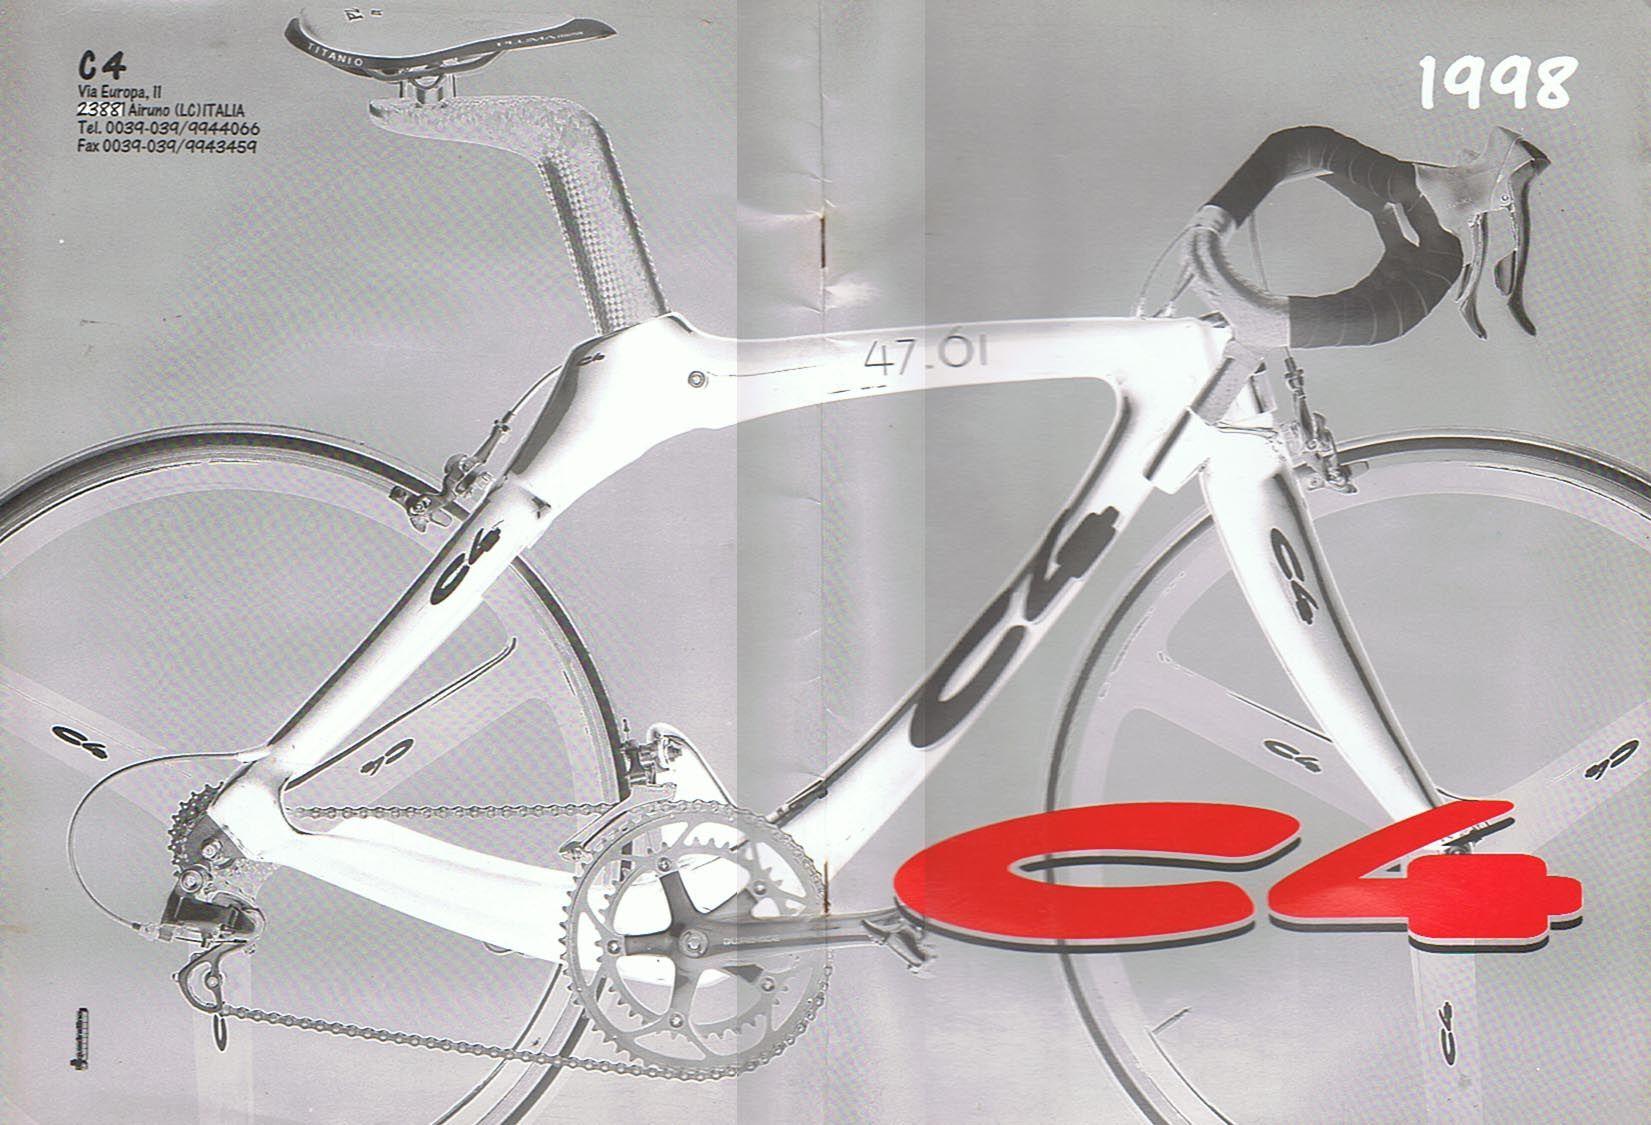 Sales Folder C4 Carbon Bikes 1998 Cover Pic Modell 47 61